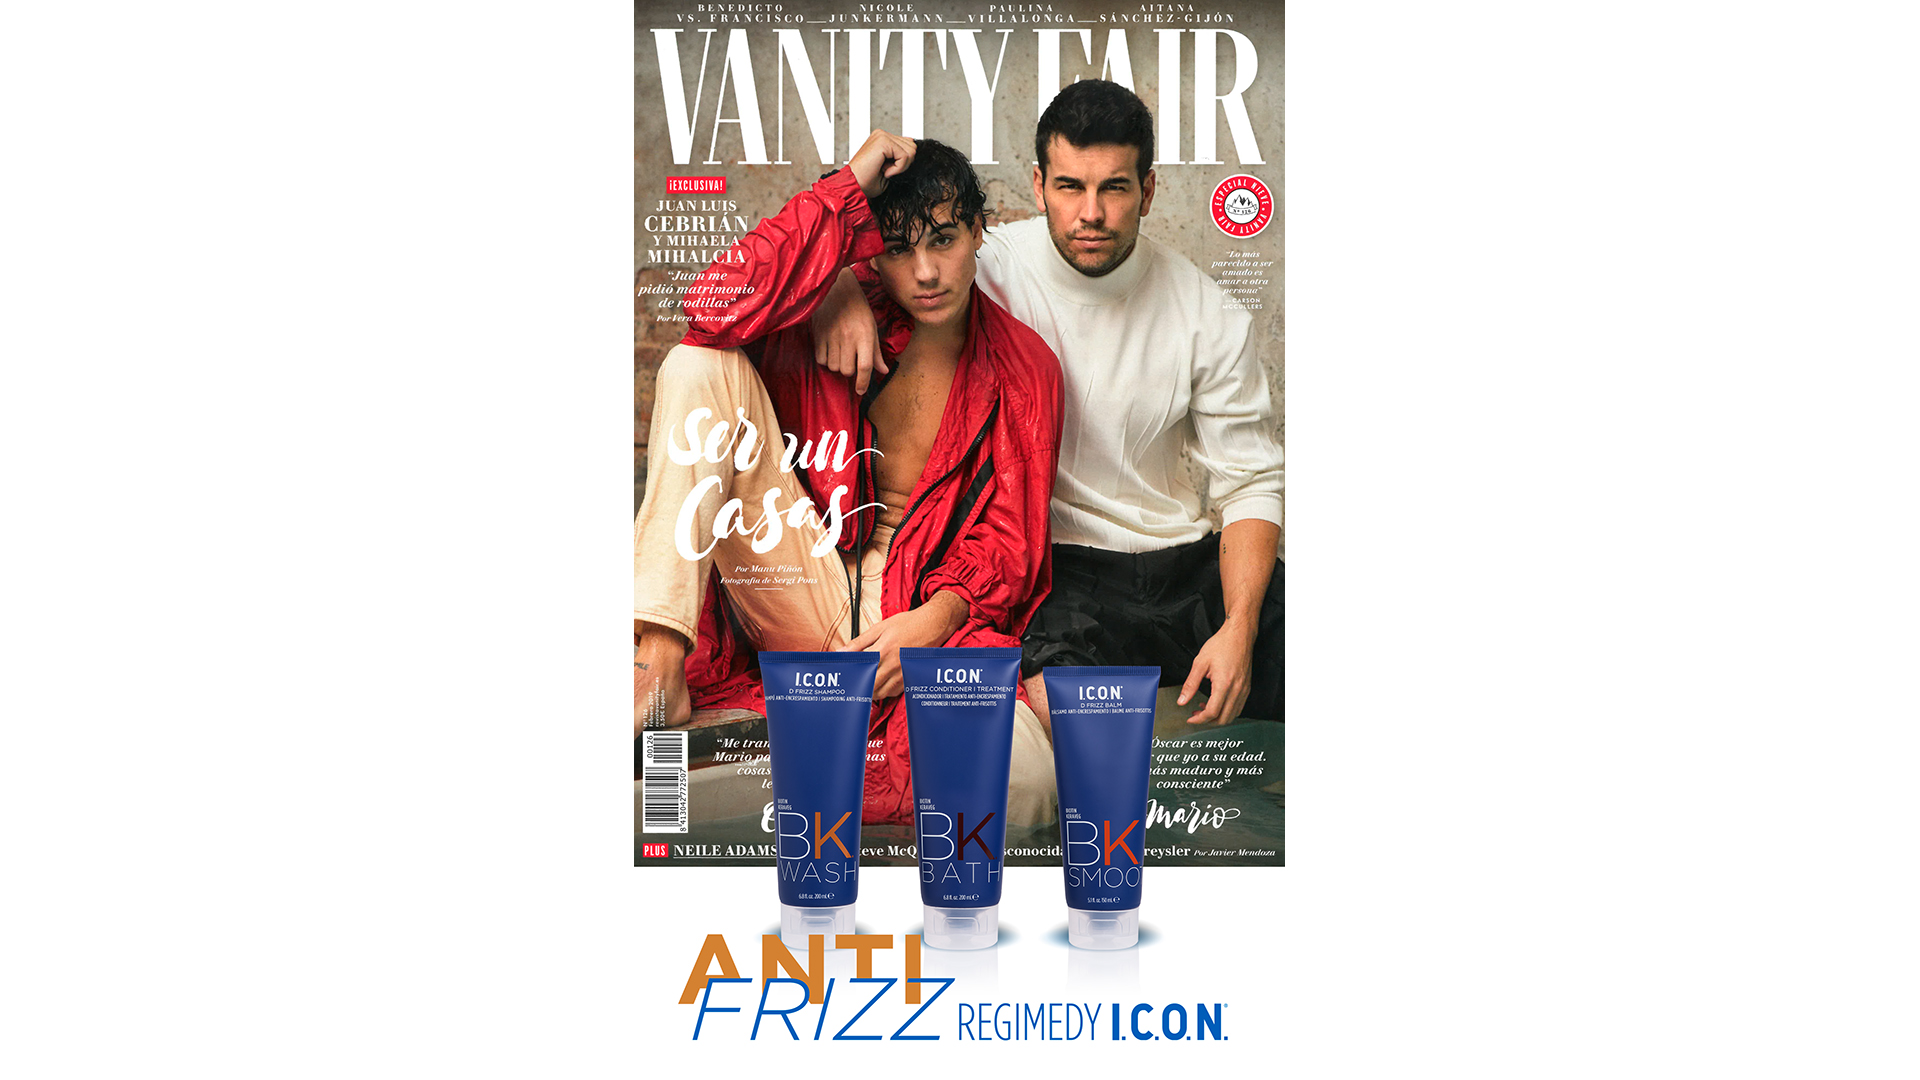 Regimedy Anti-Frizz en Vanity Fair